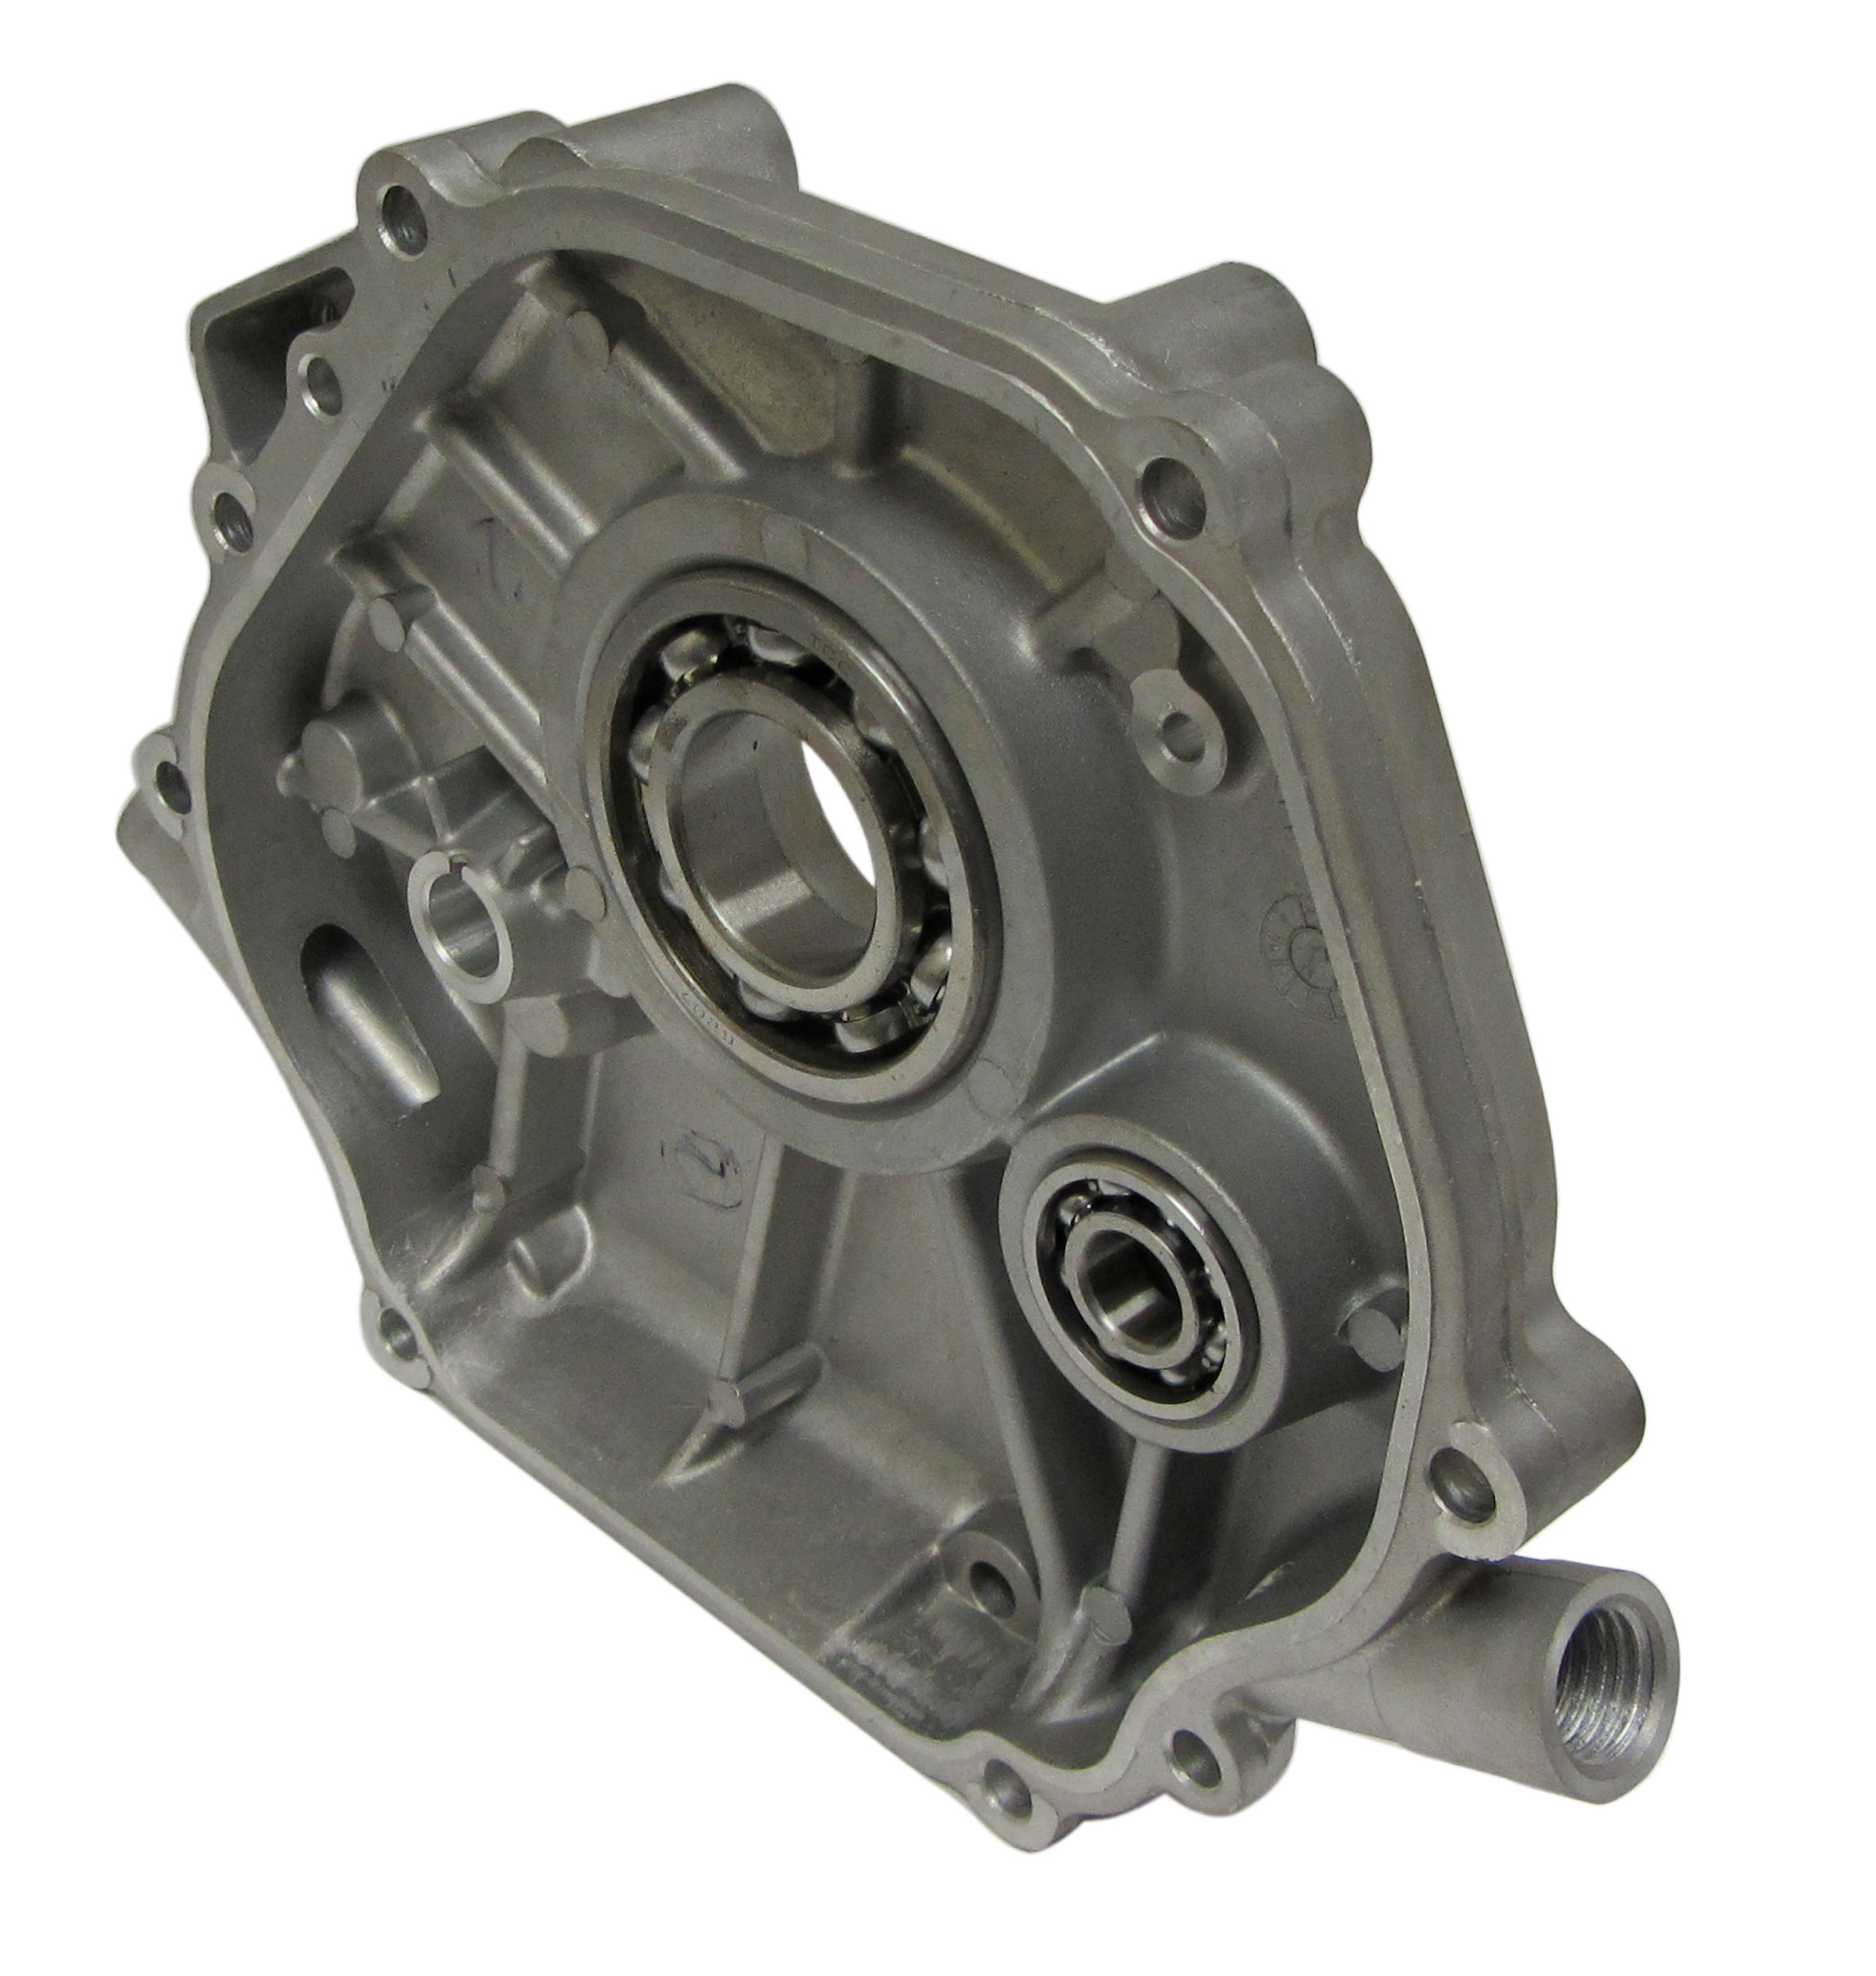 engine crankcase location transmission location